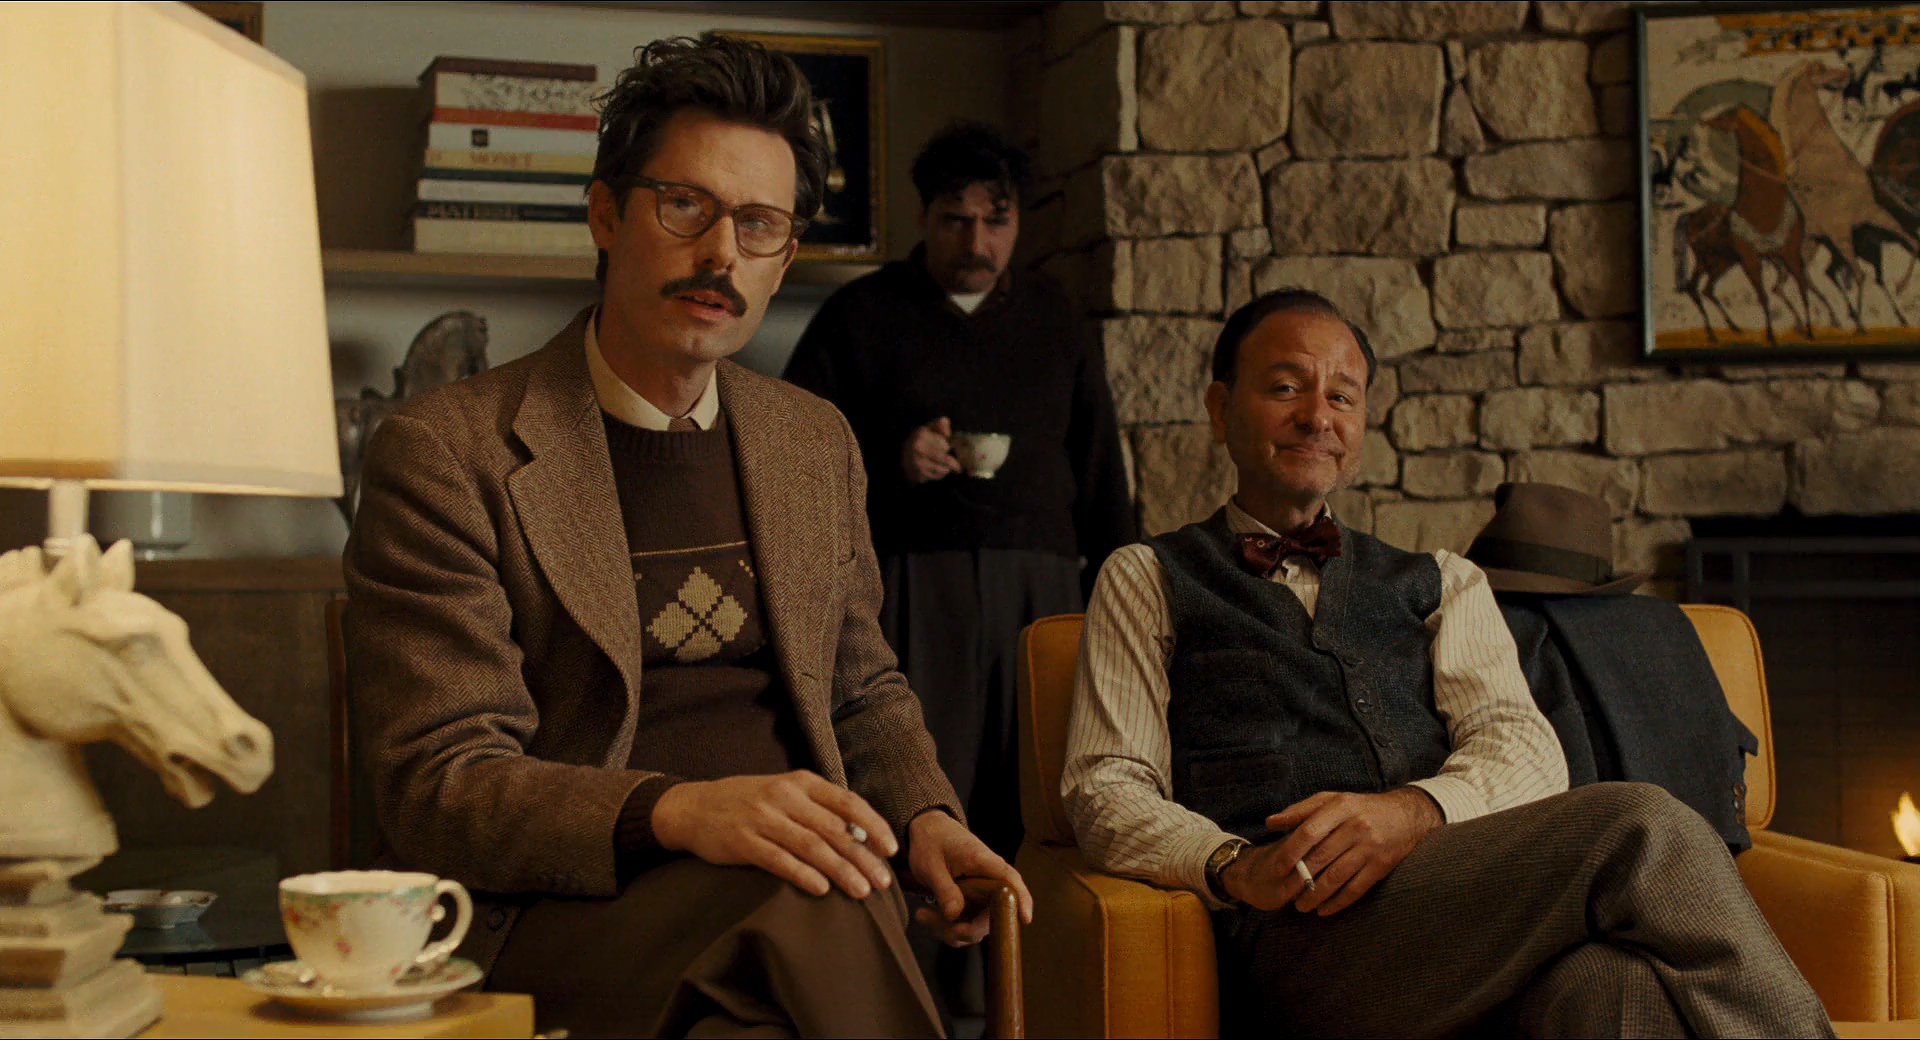 Fisher Stevens, David Krumholtz, and Tom Musgrave in Hail, Caesar! (2016)